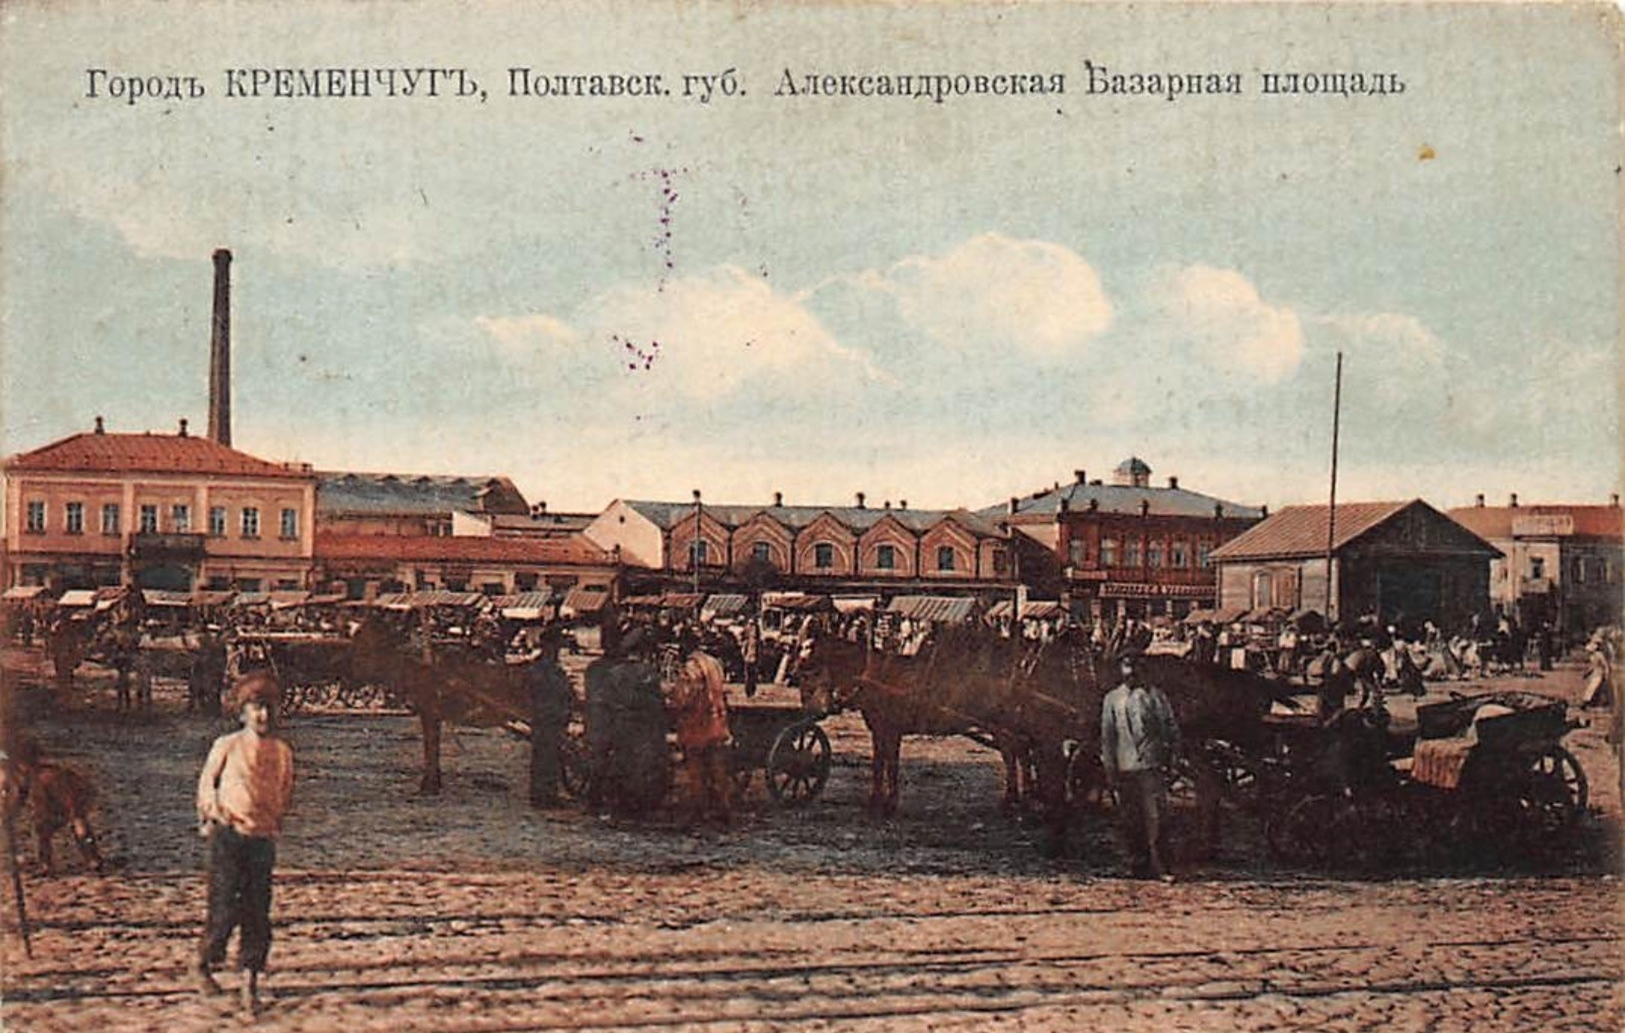 Александровская Базарная площадь